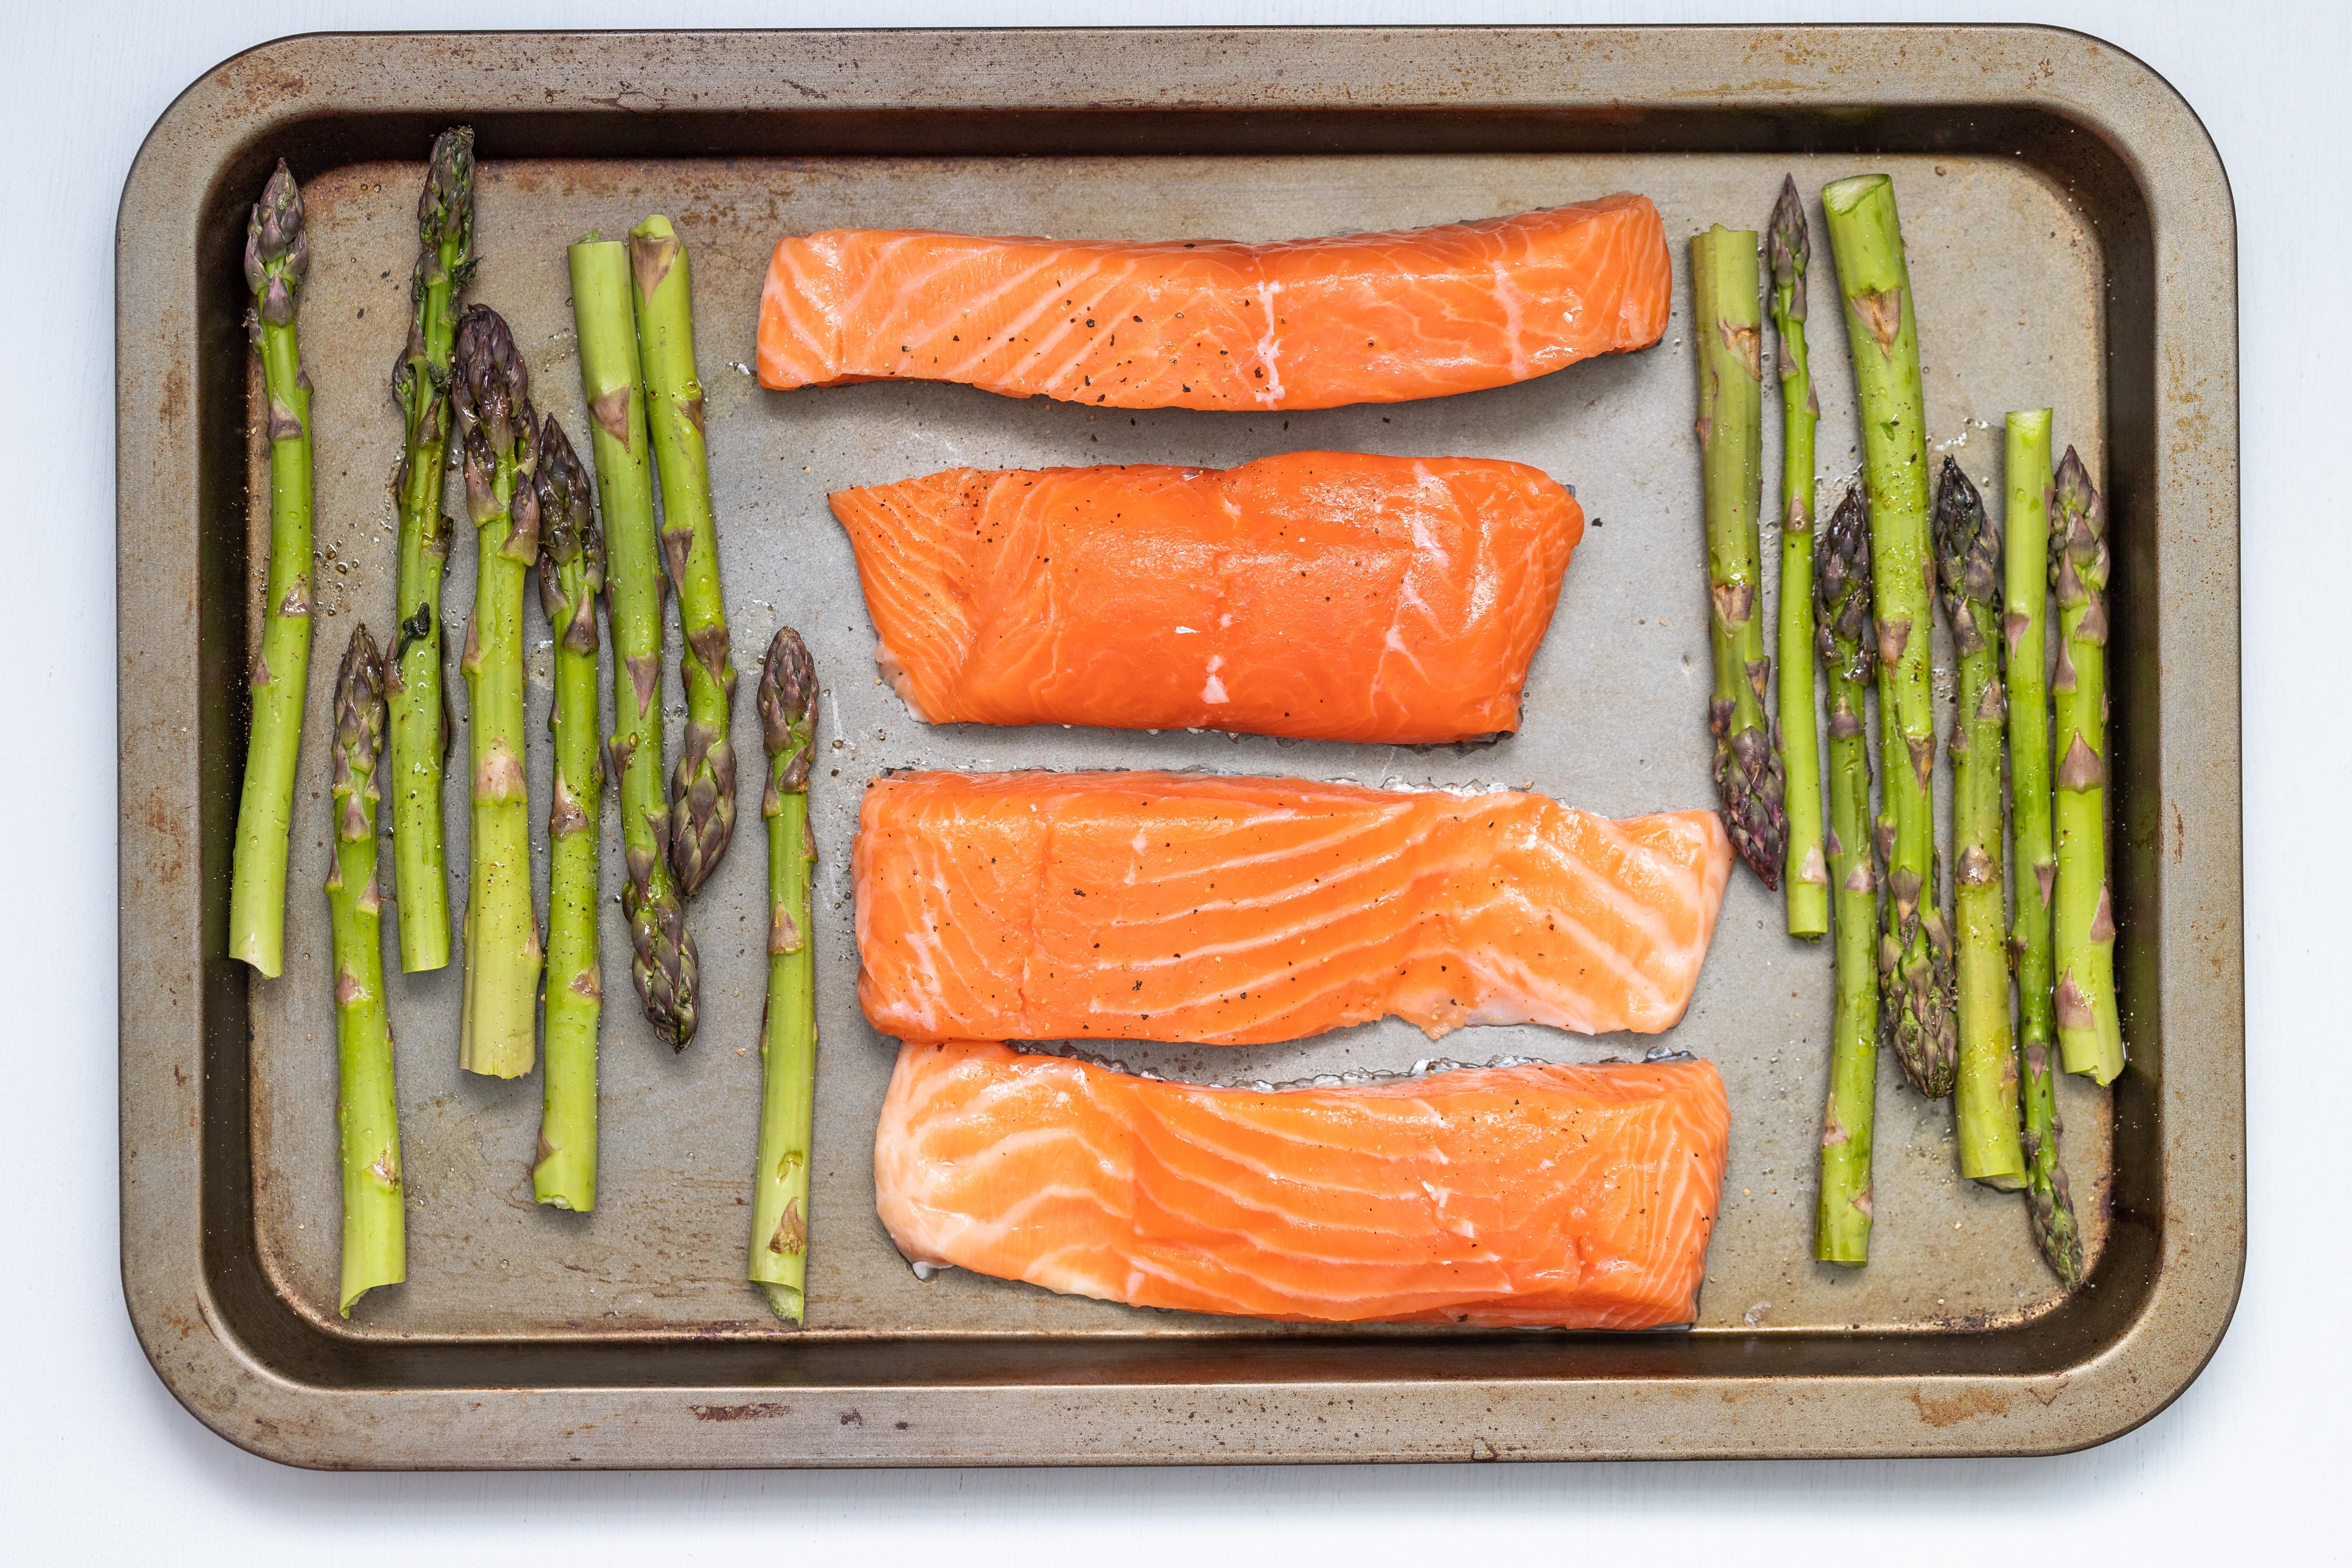 Panduan Makanan Bayi: Ikan